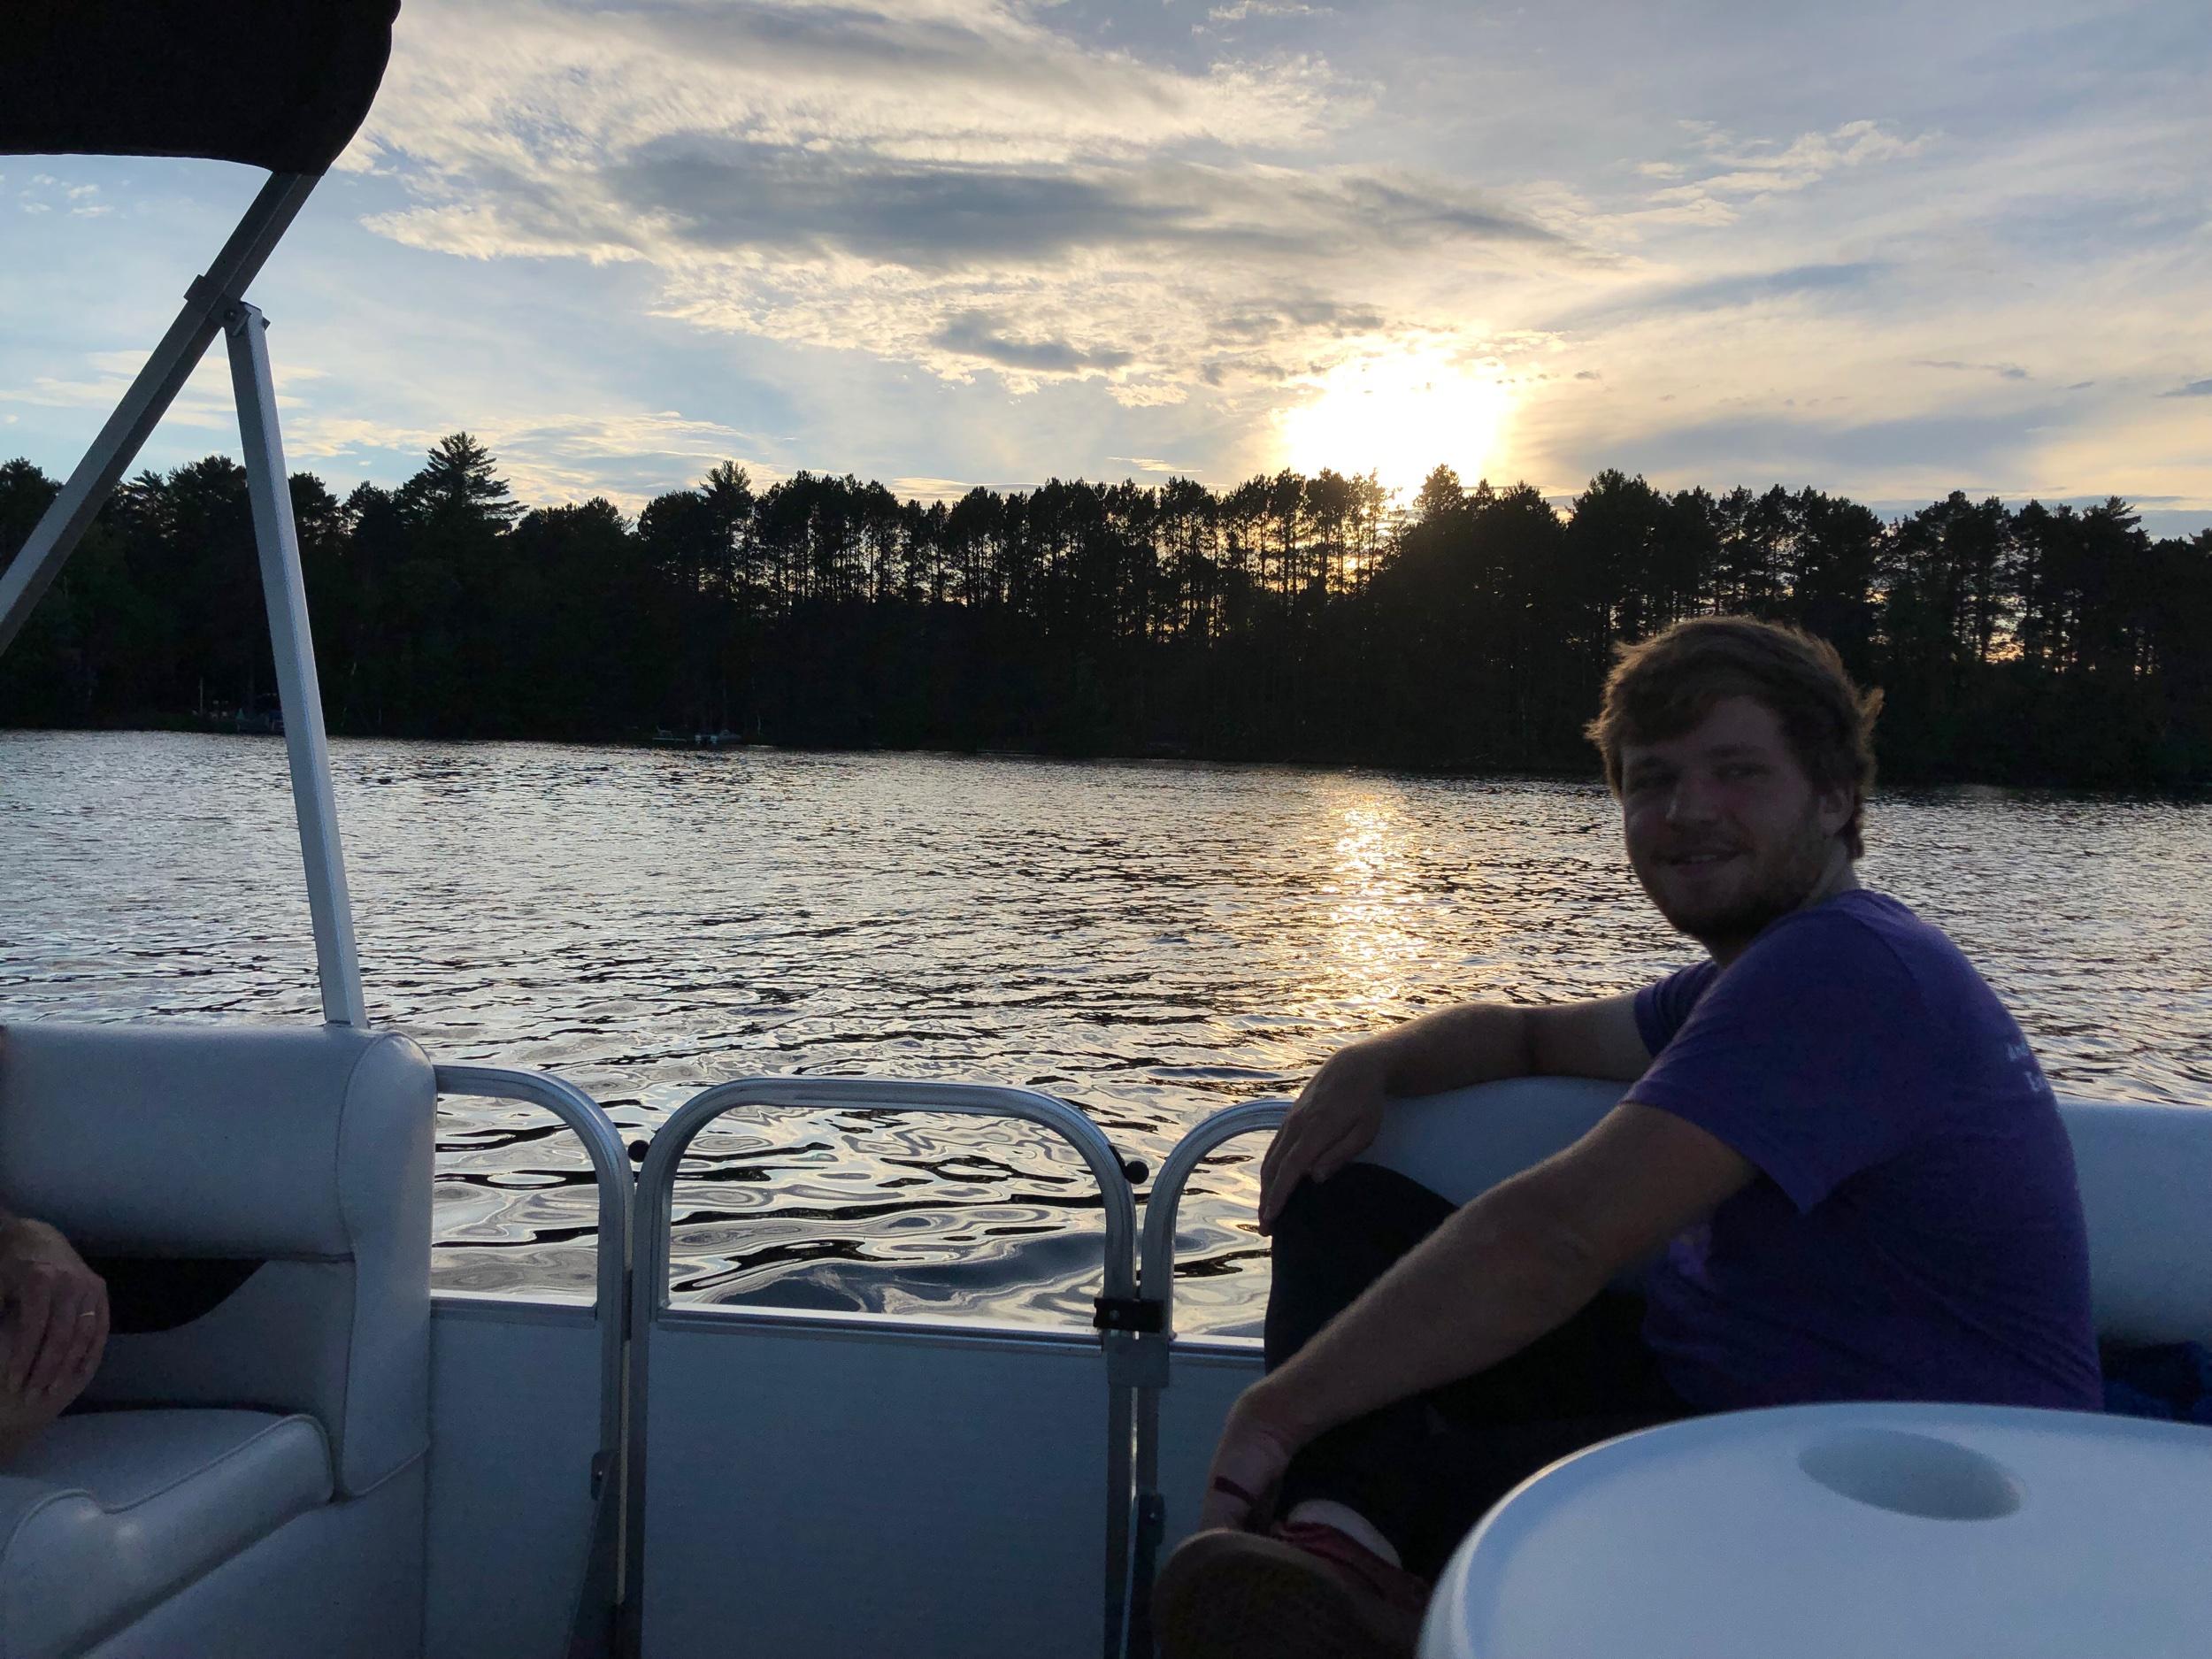 Watching the sunset on Lake Buckanabon